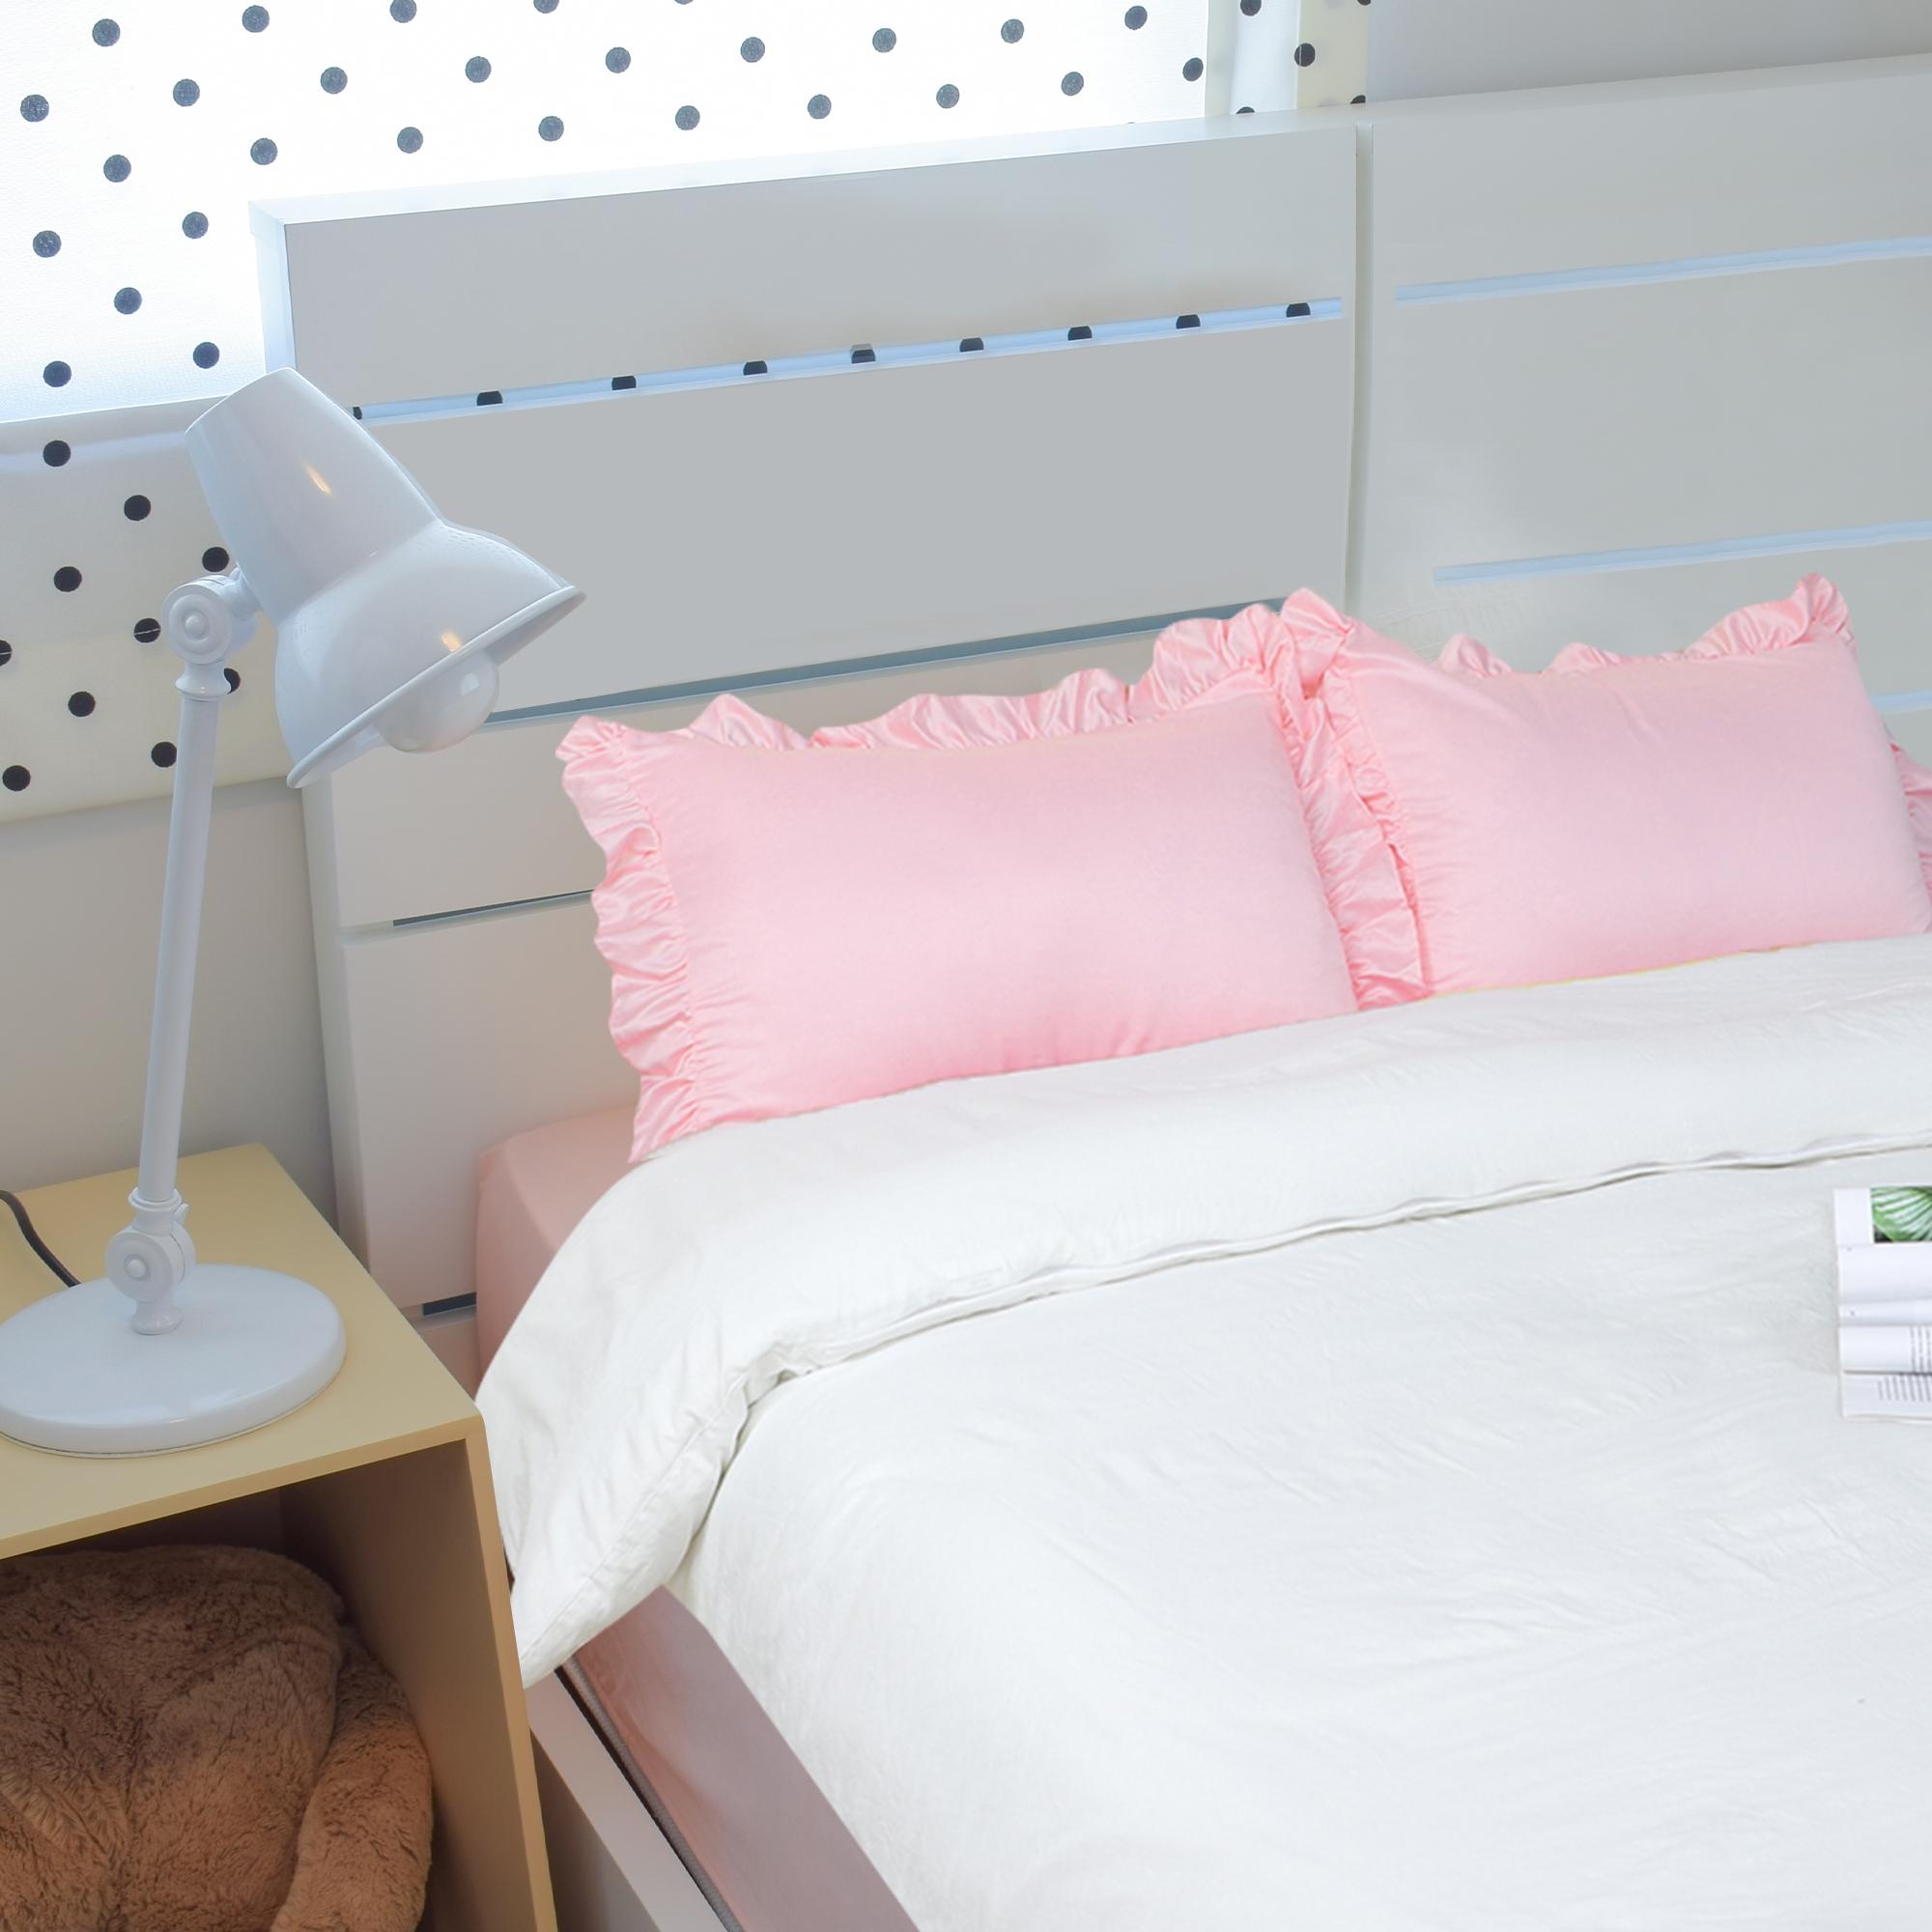 Almohadas-de-saten-de-seda-de-Funda-de-Almohada-Fundas-de-almohada-Oxford-con-volantes-Funda-de miniatura 20